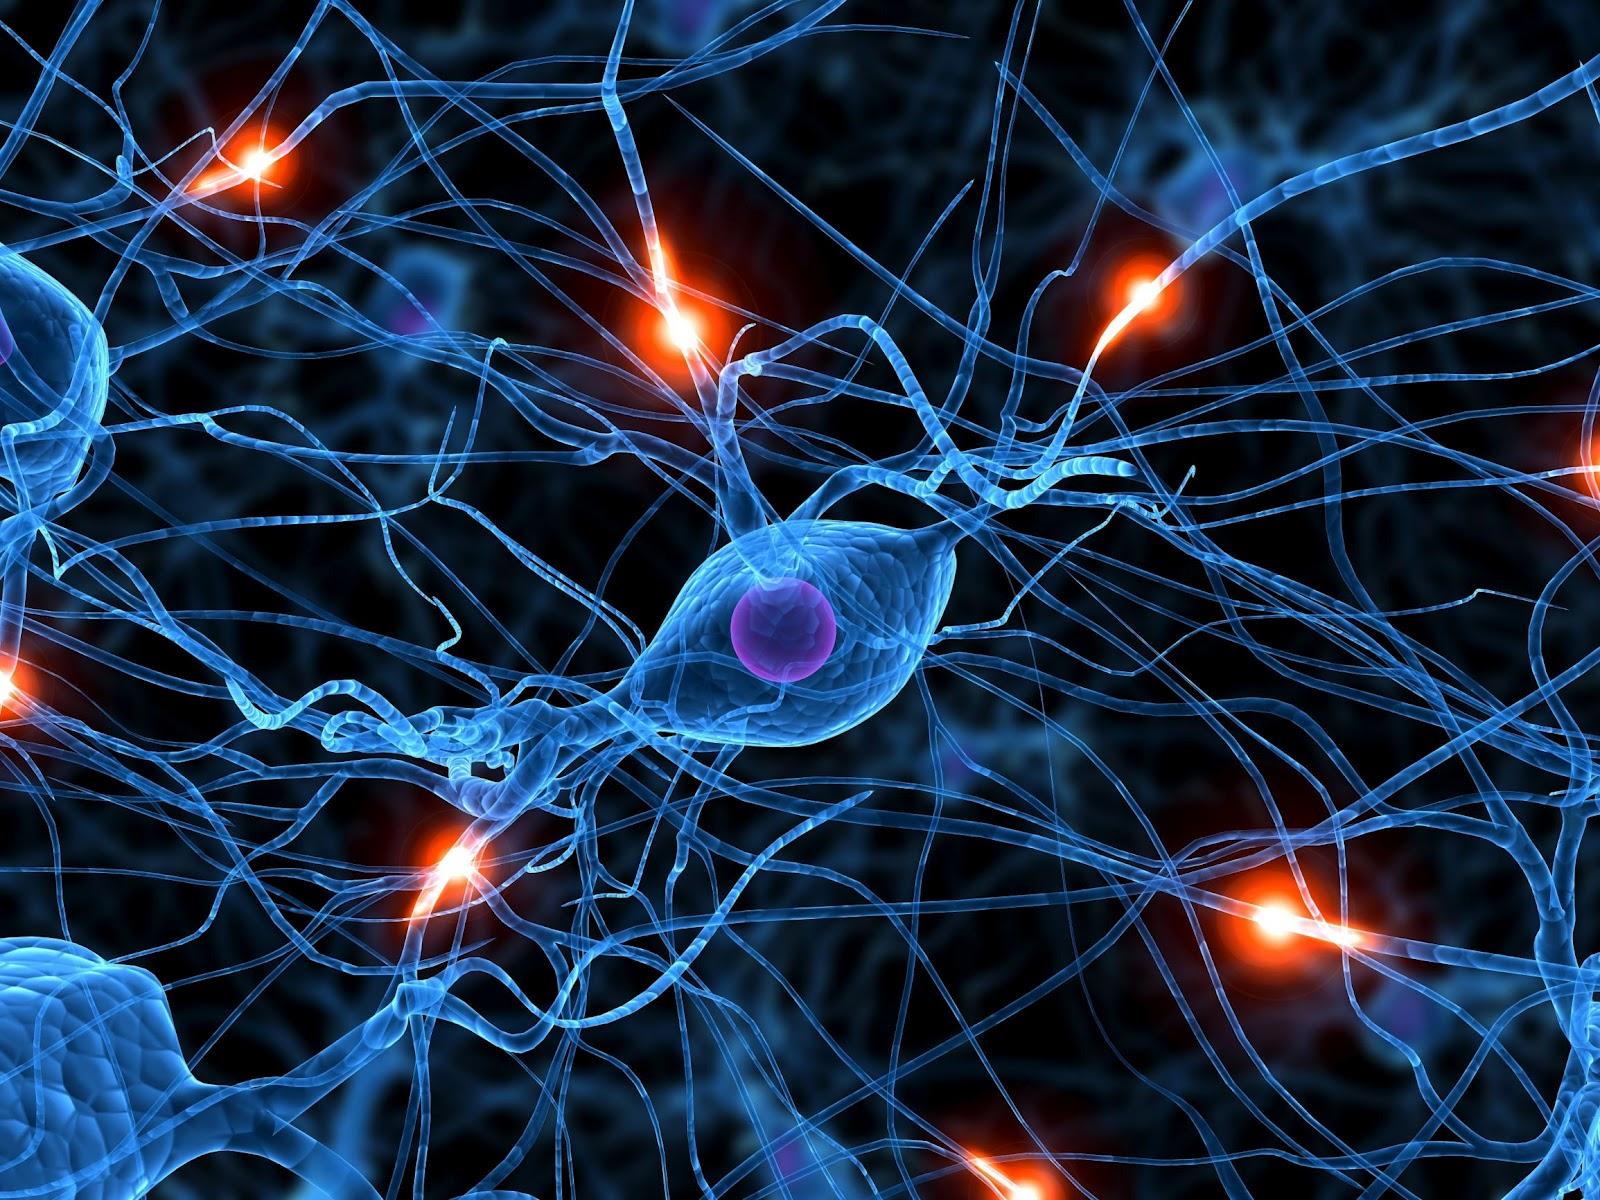 http://1.bp.blogspot.com/-sgEK_aD_ZUI/T0fsFMIxMFI/AAAAAAAABWQ/chJcrzZ4Fv0/s1600/neurona.jpg